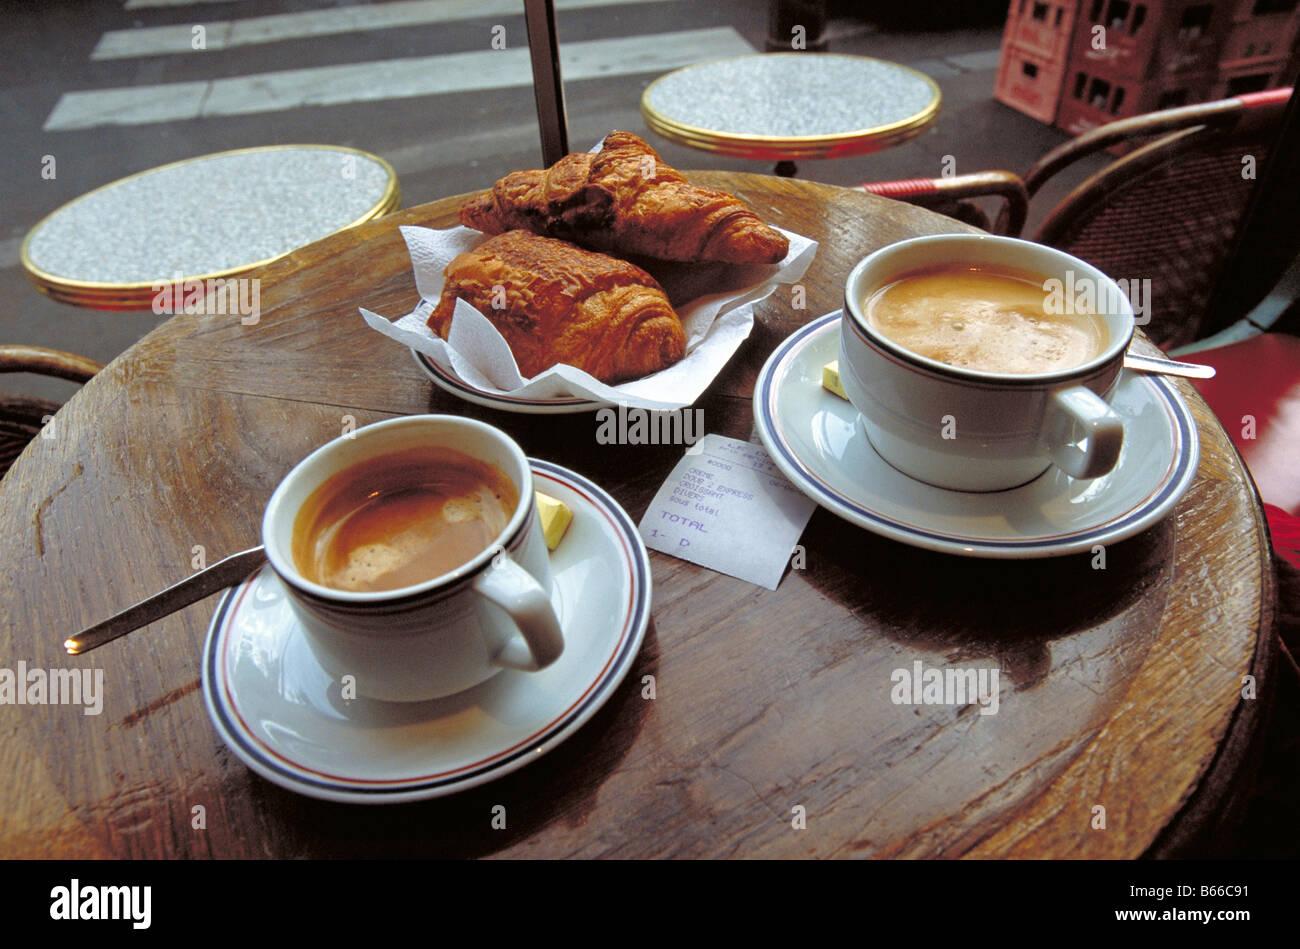 Paris Morning Cafe Bakery